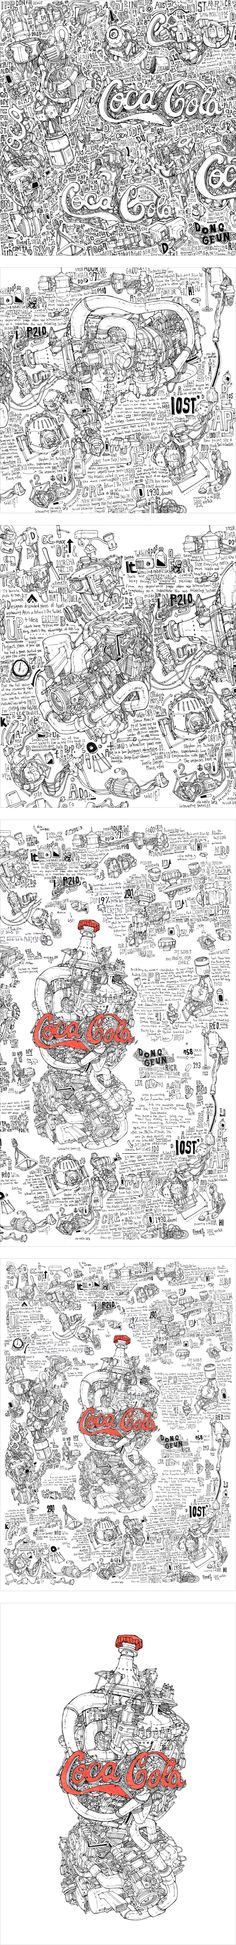 Coca-Cola - 그래픽디자인, 드로잉, 일러스트